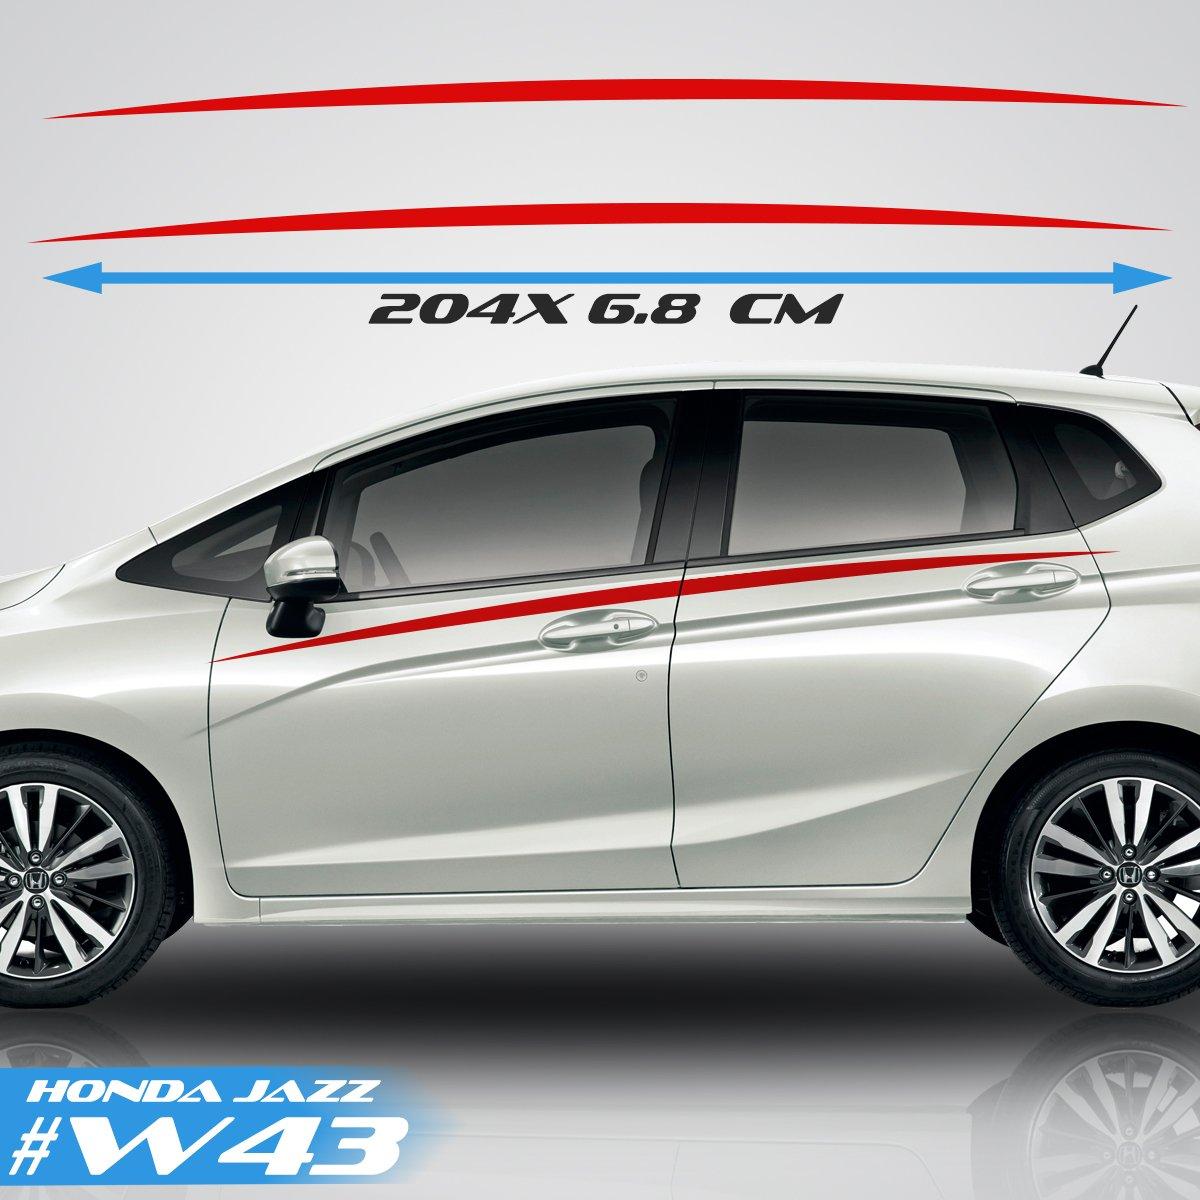 Honda Jazz Car Side Stripes Car Stickers Graphics Vinyl Decal